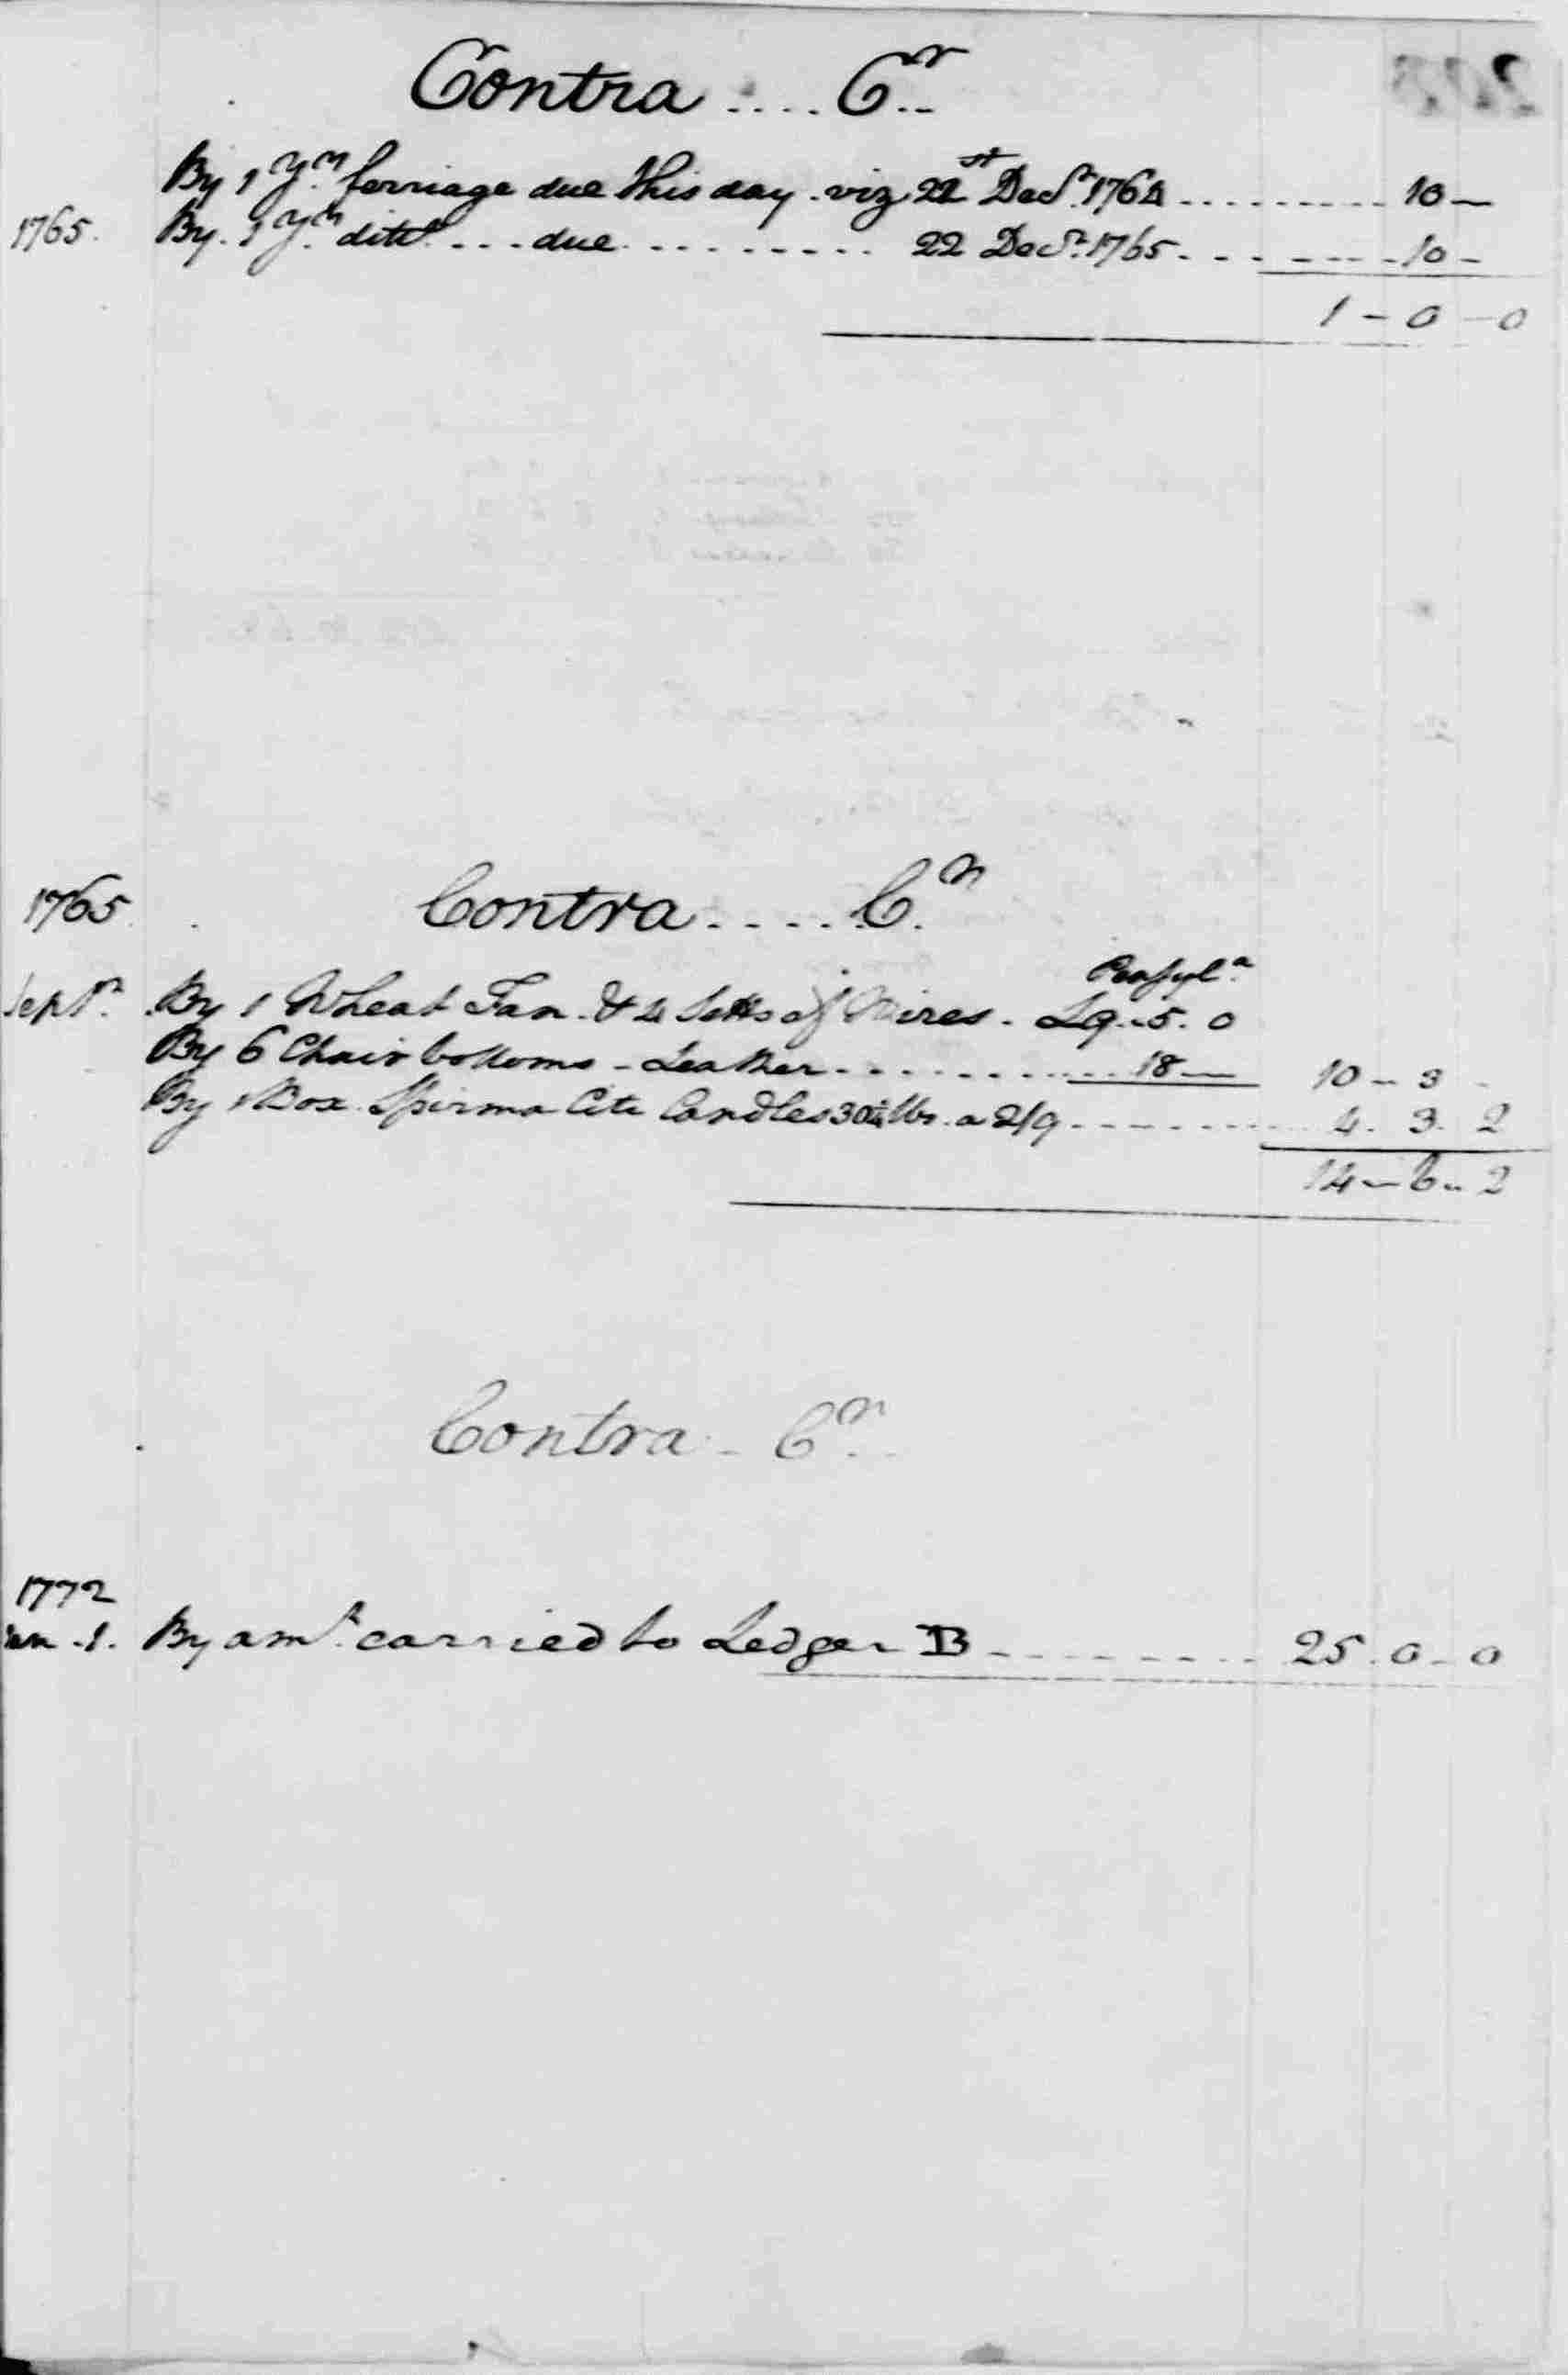 Ledger A, folio 202, right side